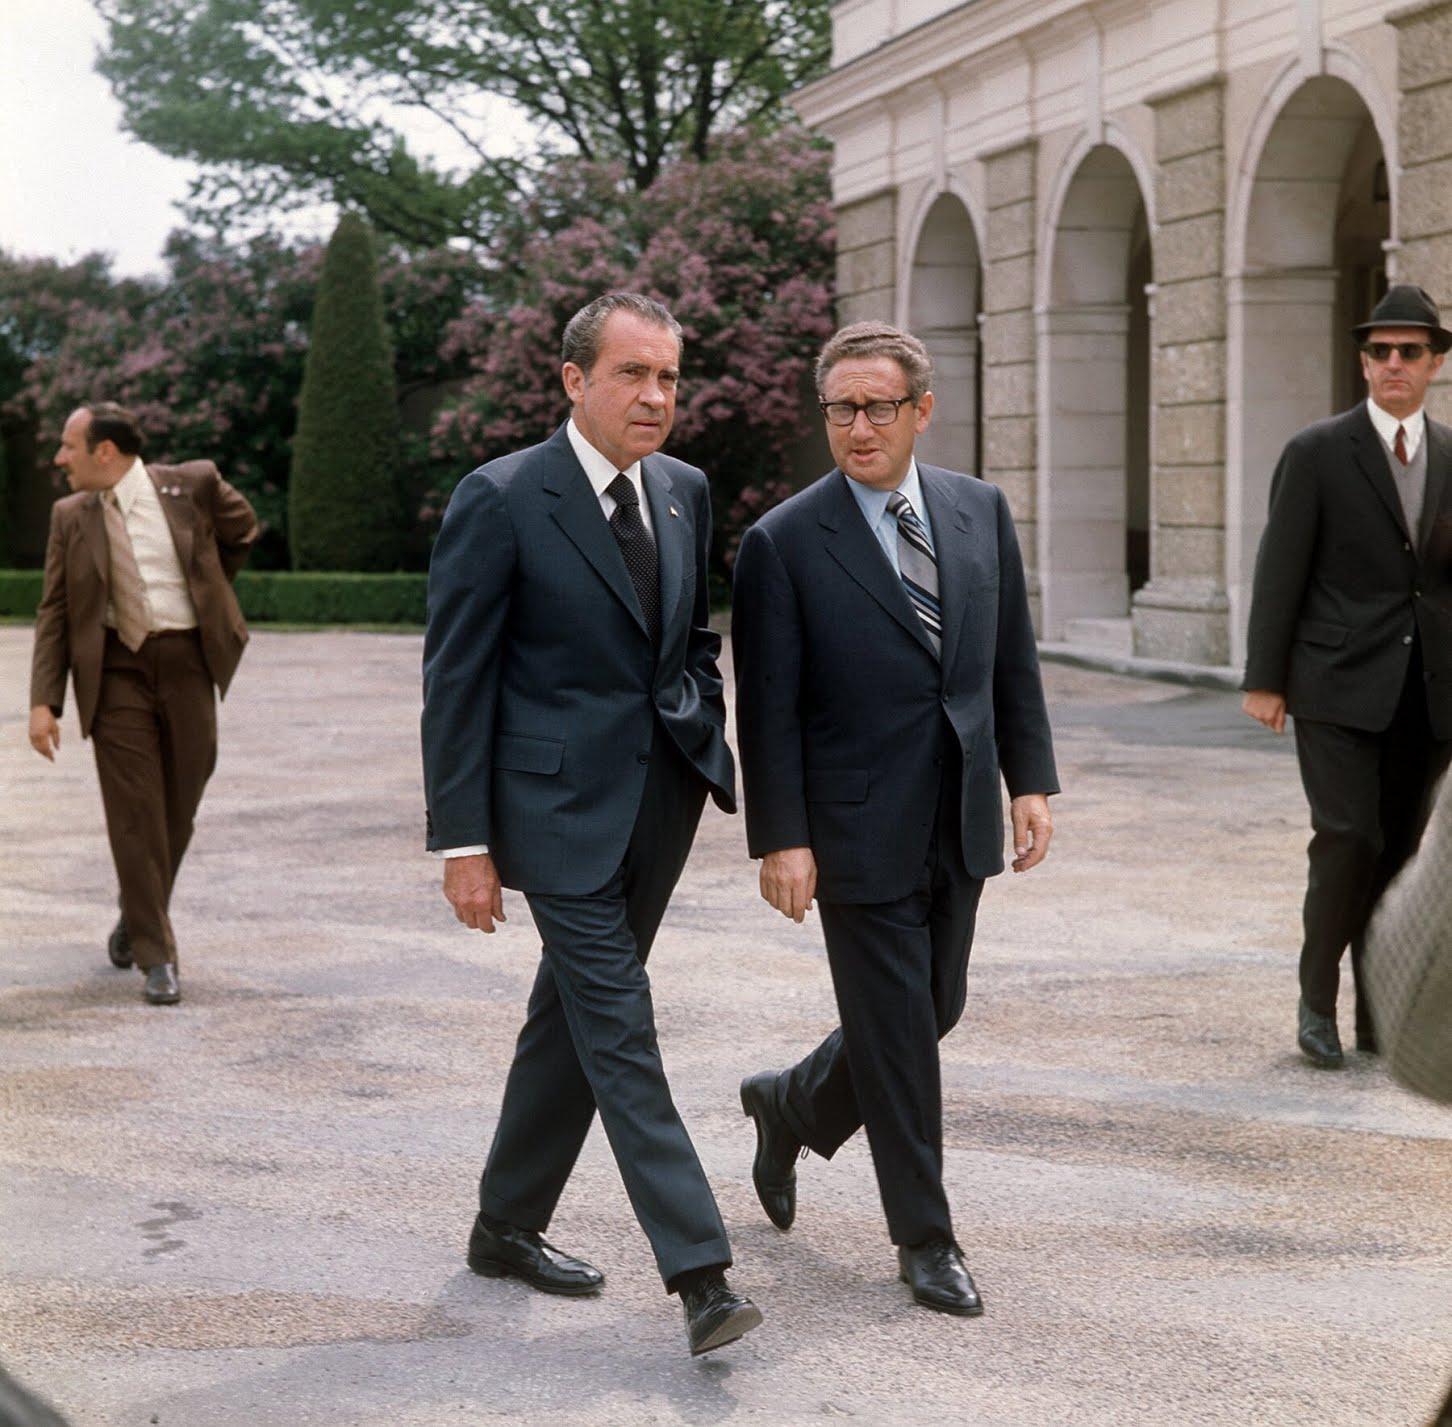 President Richard Nixon and his national security adviser, Henry Kissinger, in 1972.